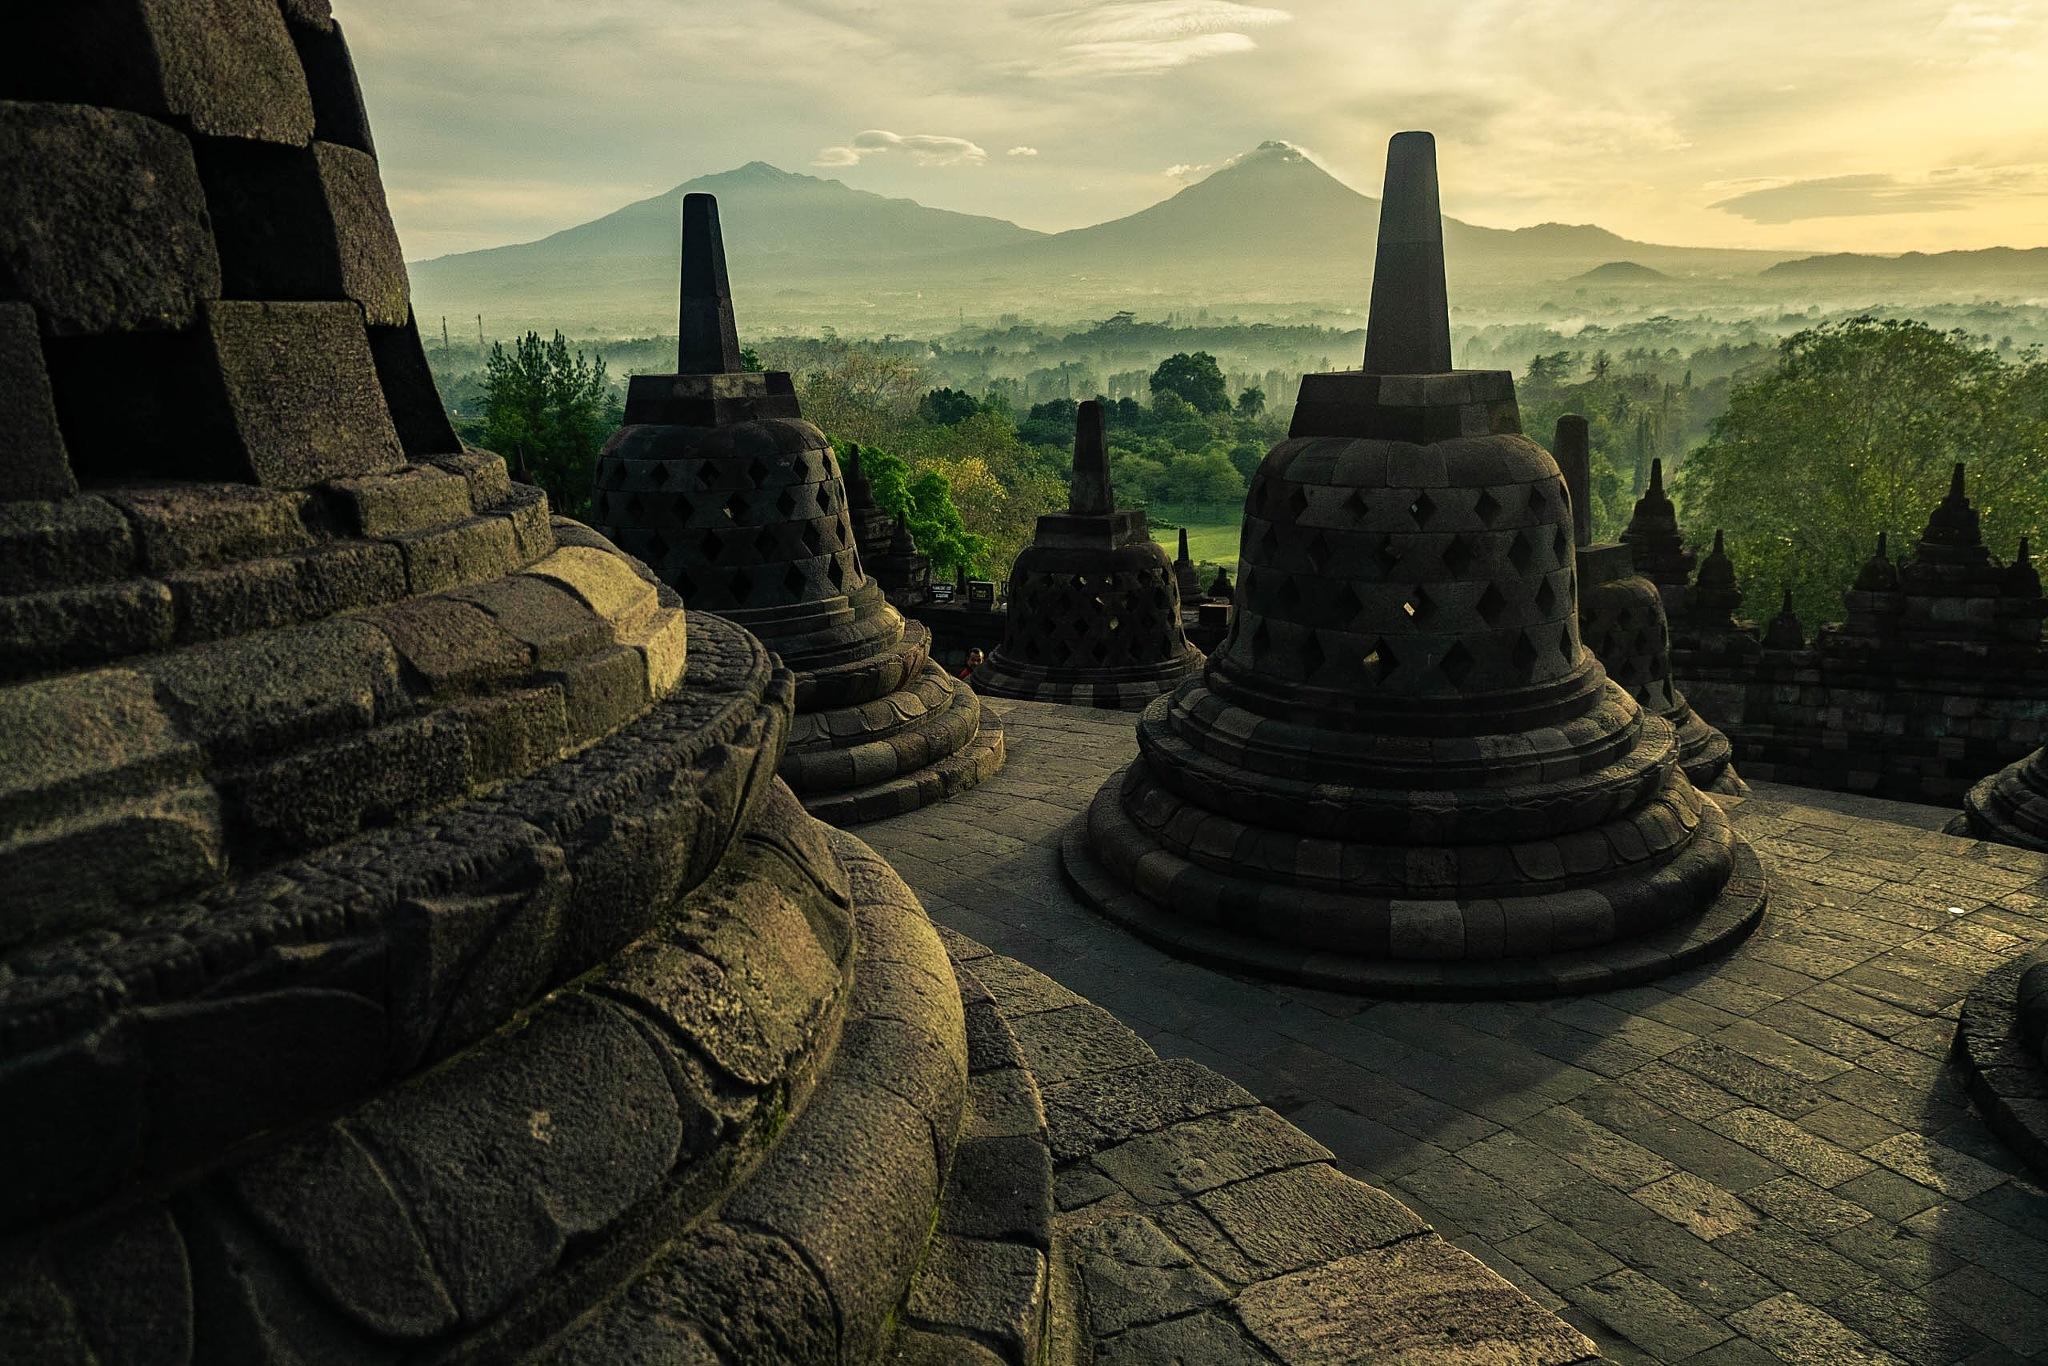 Sunrise at Borobudur Temple. Yogyakarta by Noa Le Gouellec